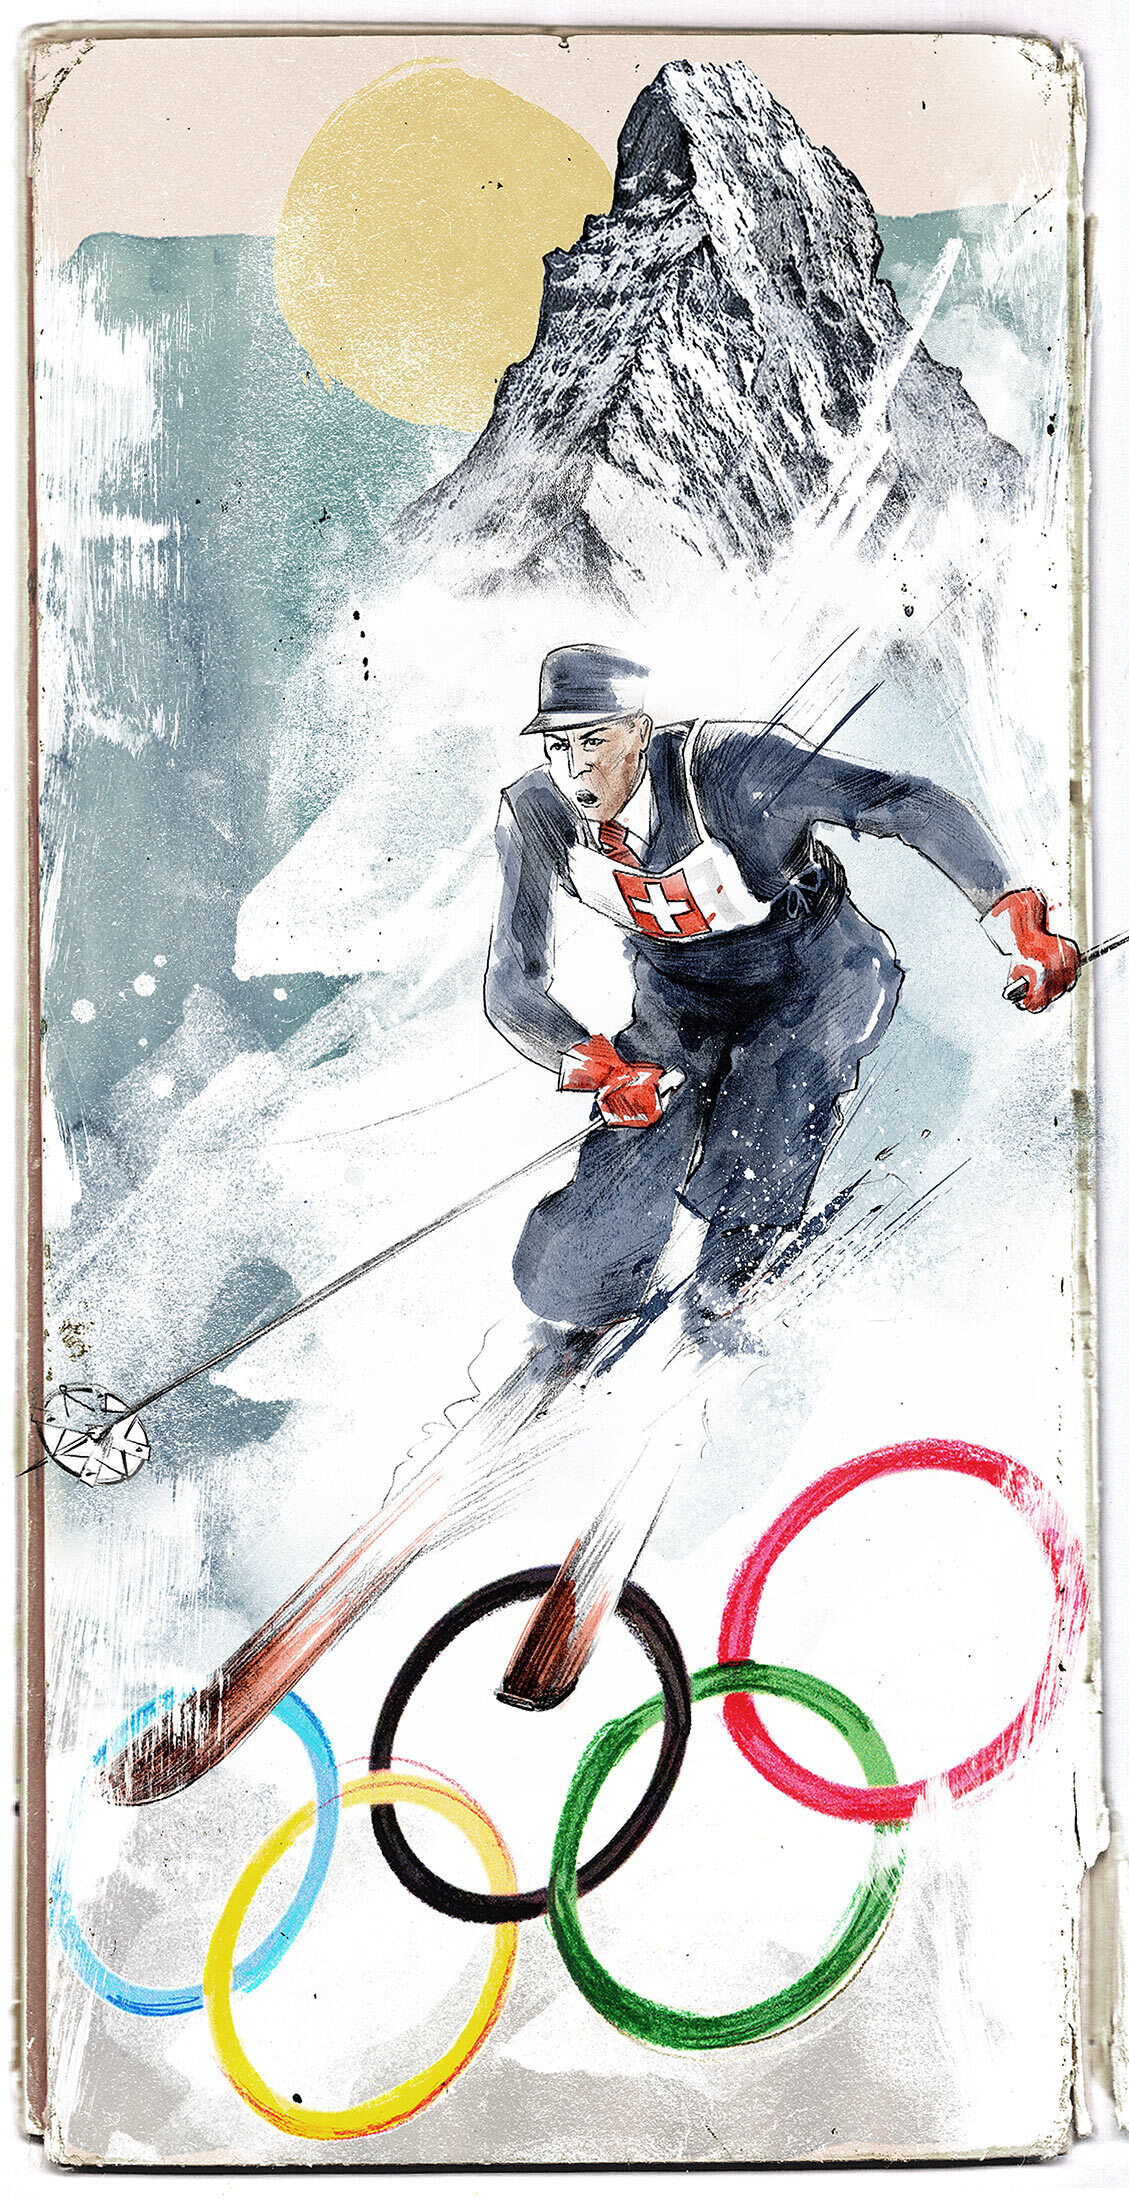 Olympia ski vintage switzerland matterhorn - Kornel Illustration | Kornel Stadler portfolio